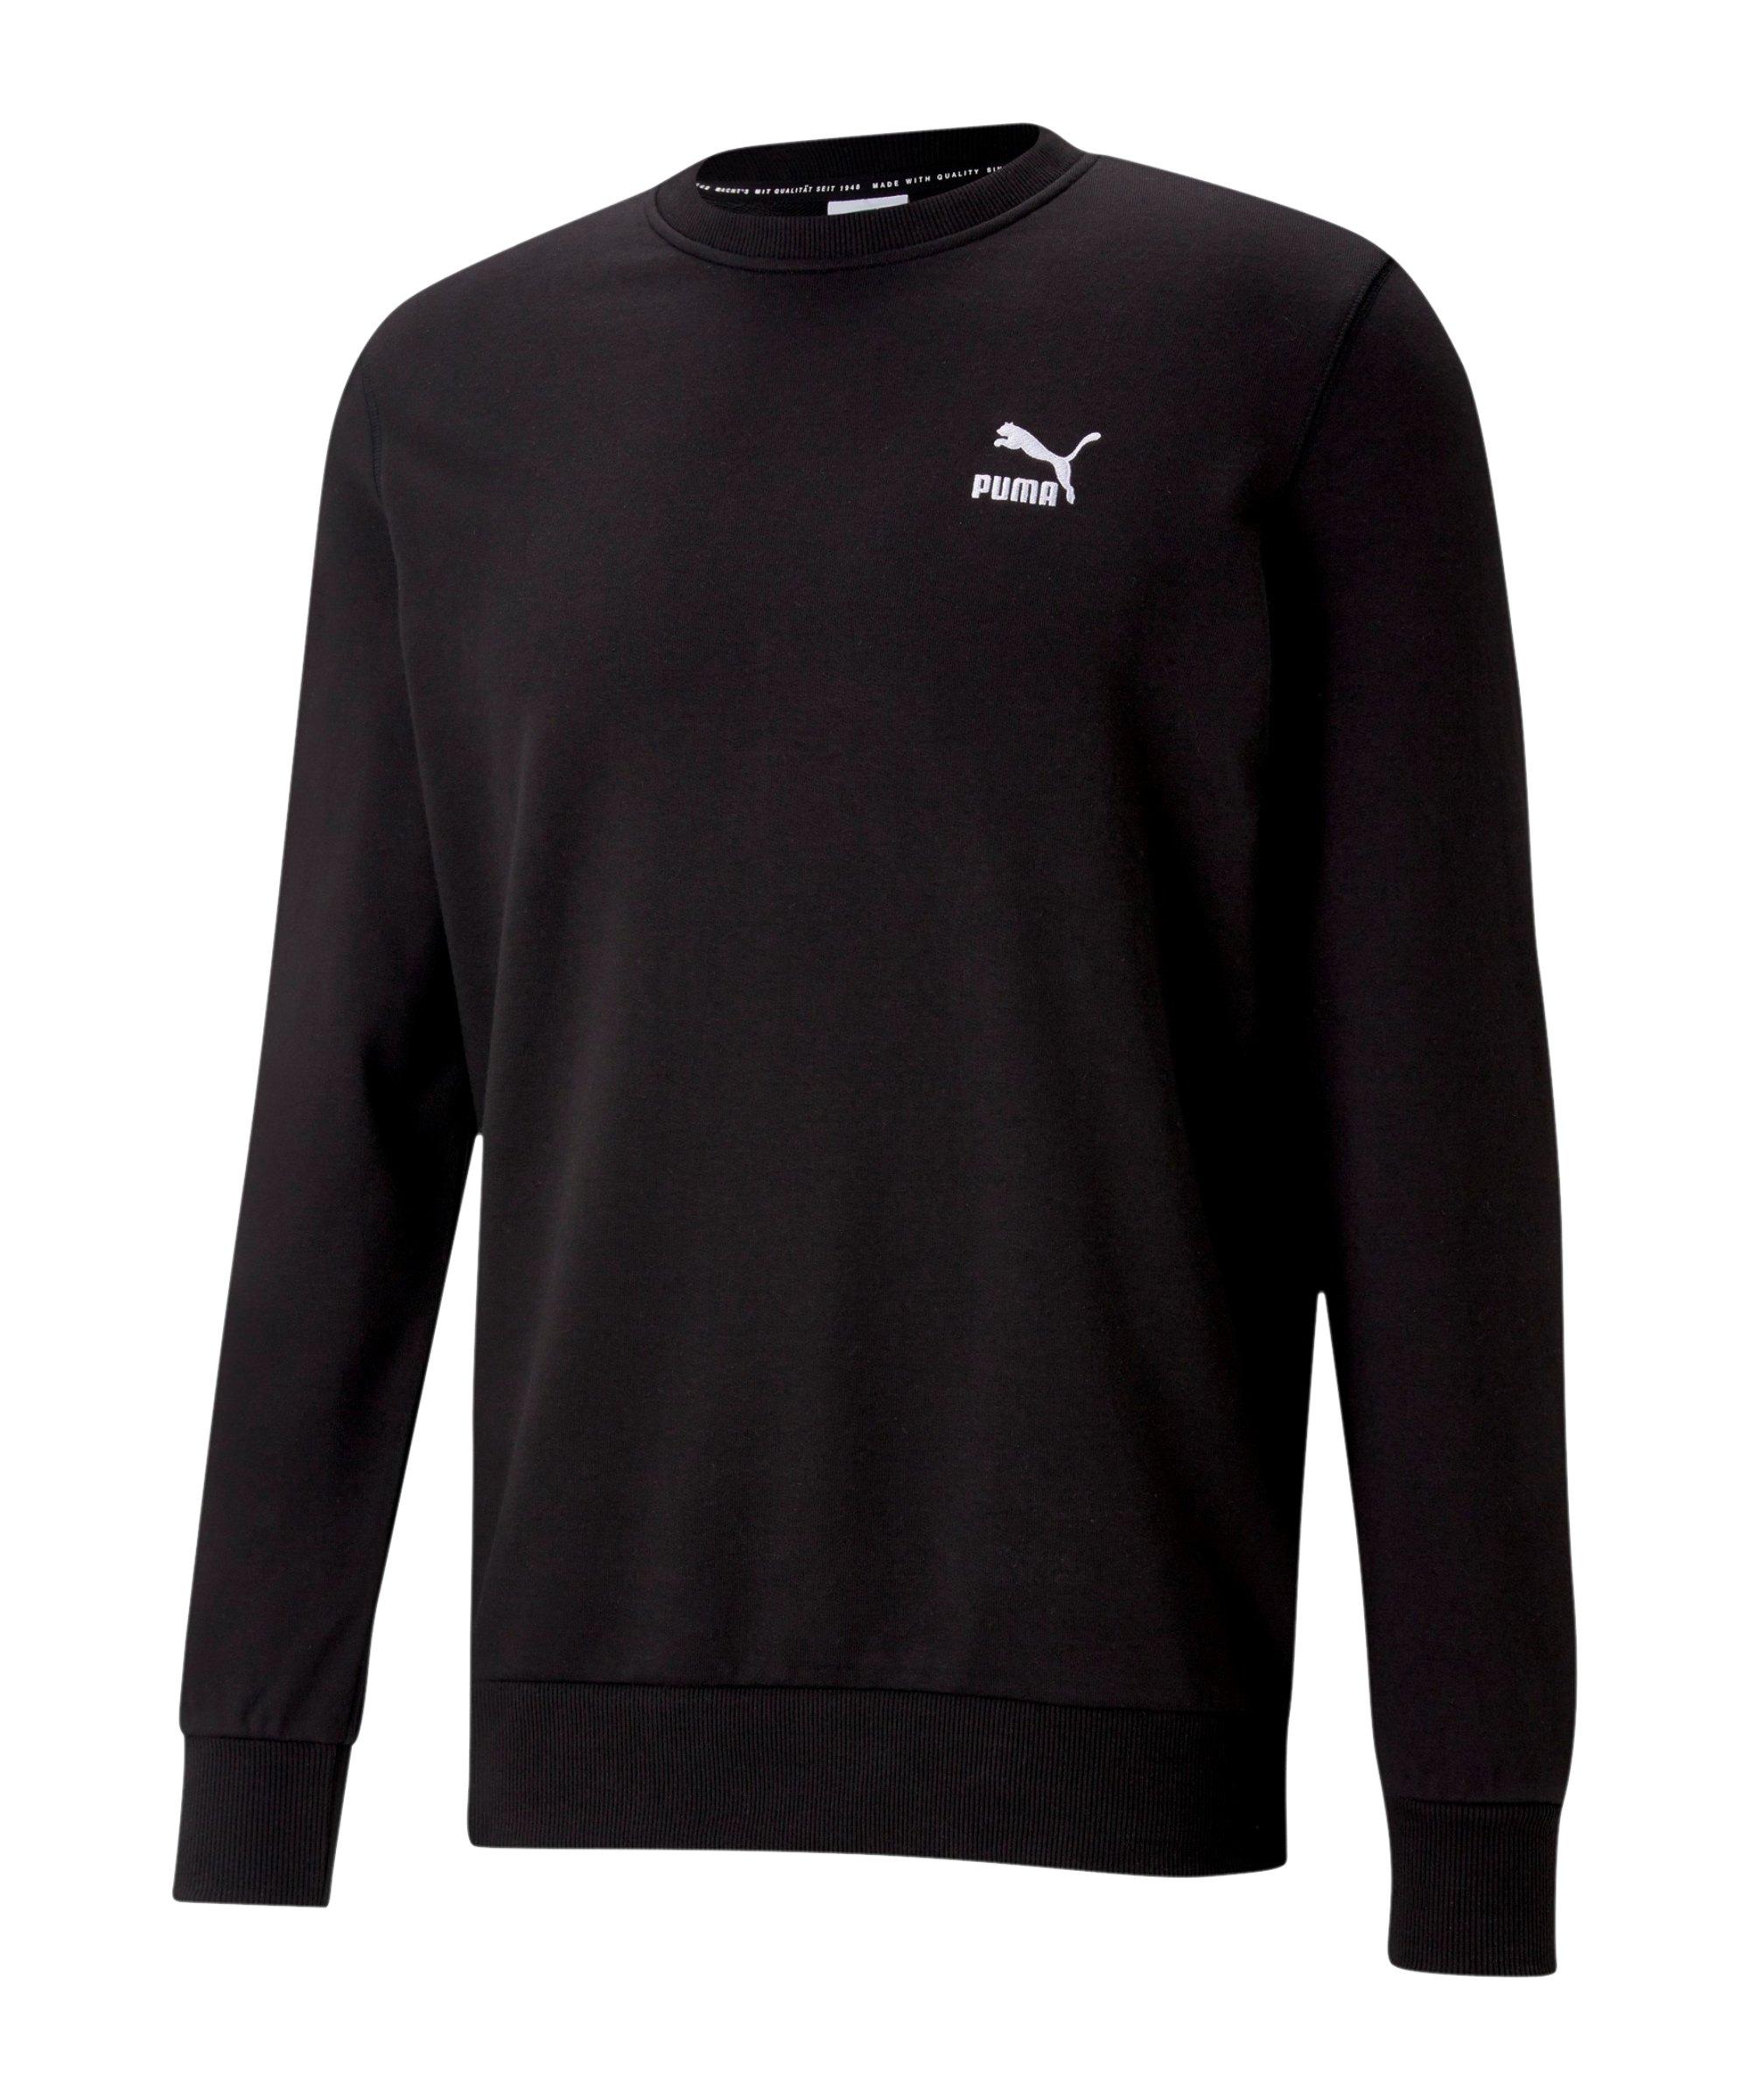 PUMA Classics Embro Crew Sweatshirt Schwarz F01 - schwarz